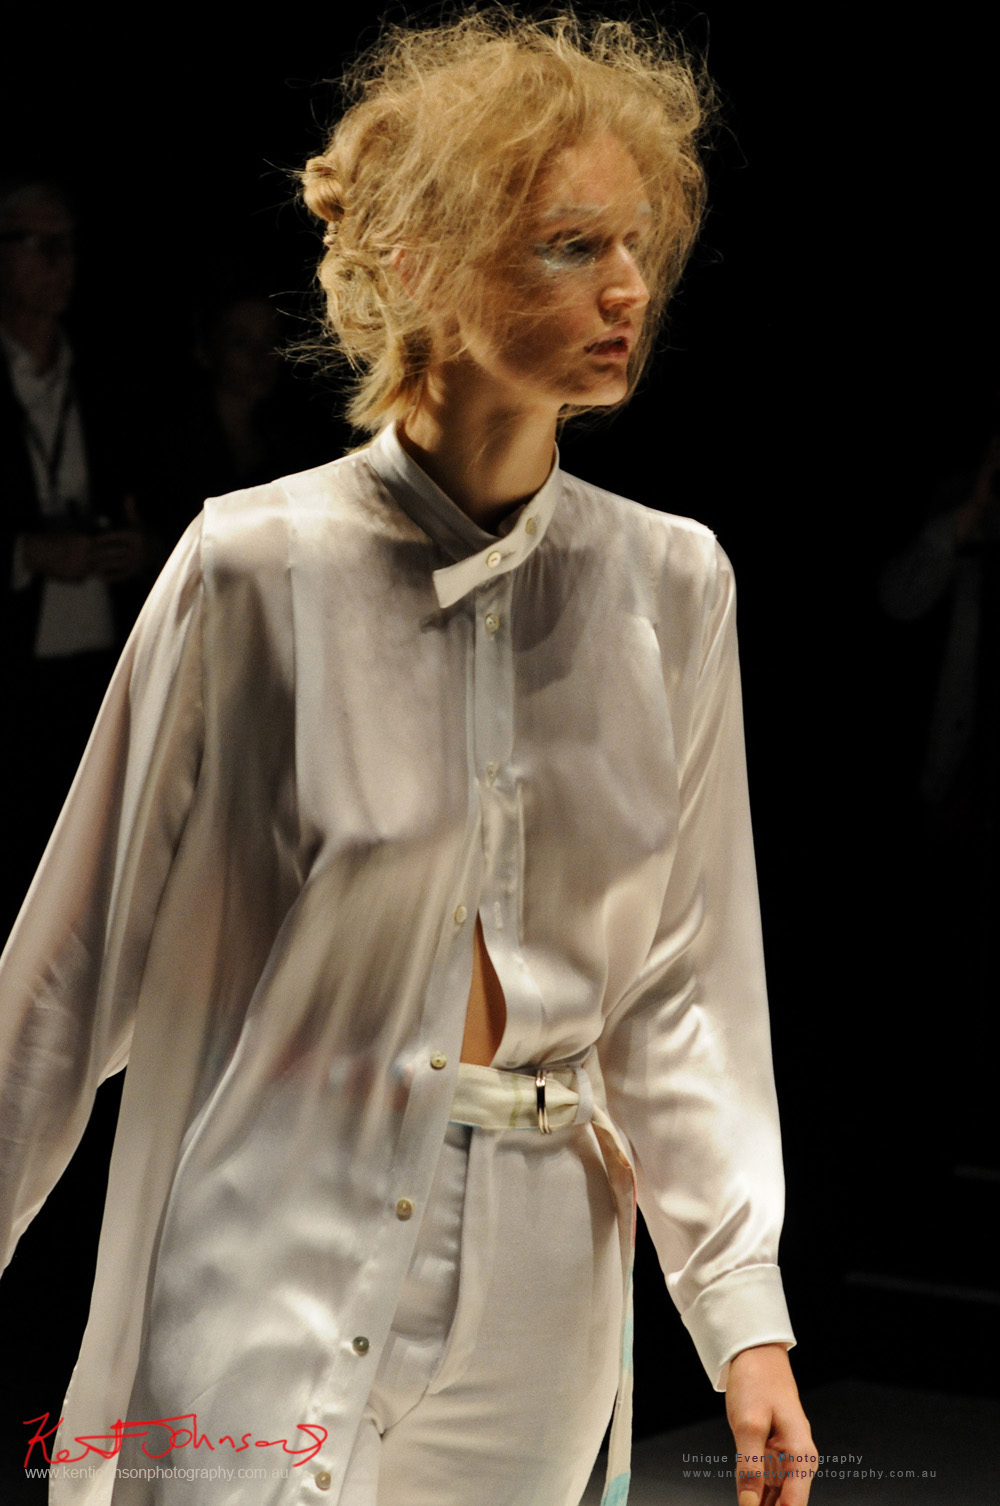 Women's wear, silk blouse and white pants, DE LA MOTTE; Anne De La Motte - Designers from Raffles International Showcase 2016 - MBFWA  Photographed by Kent Johnson.